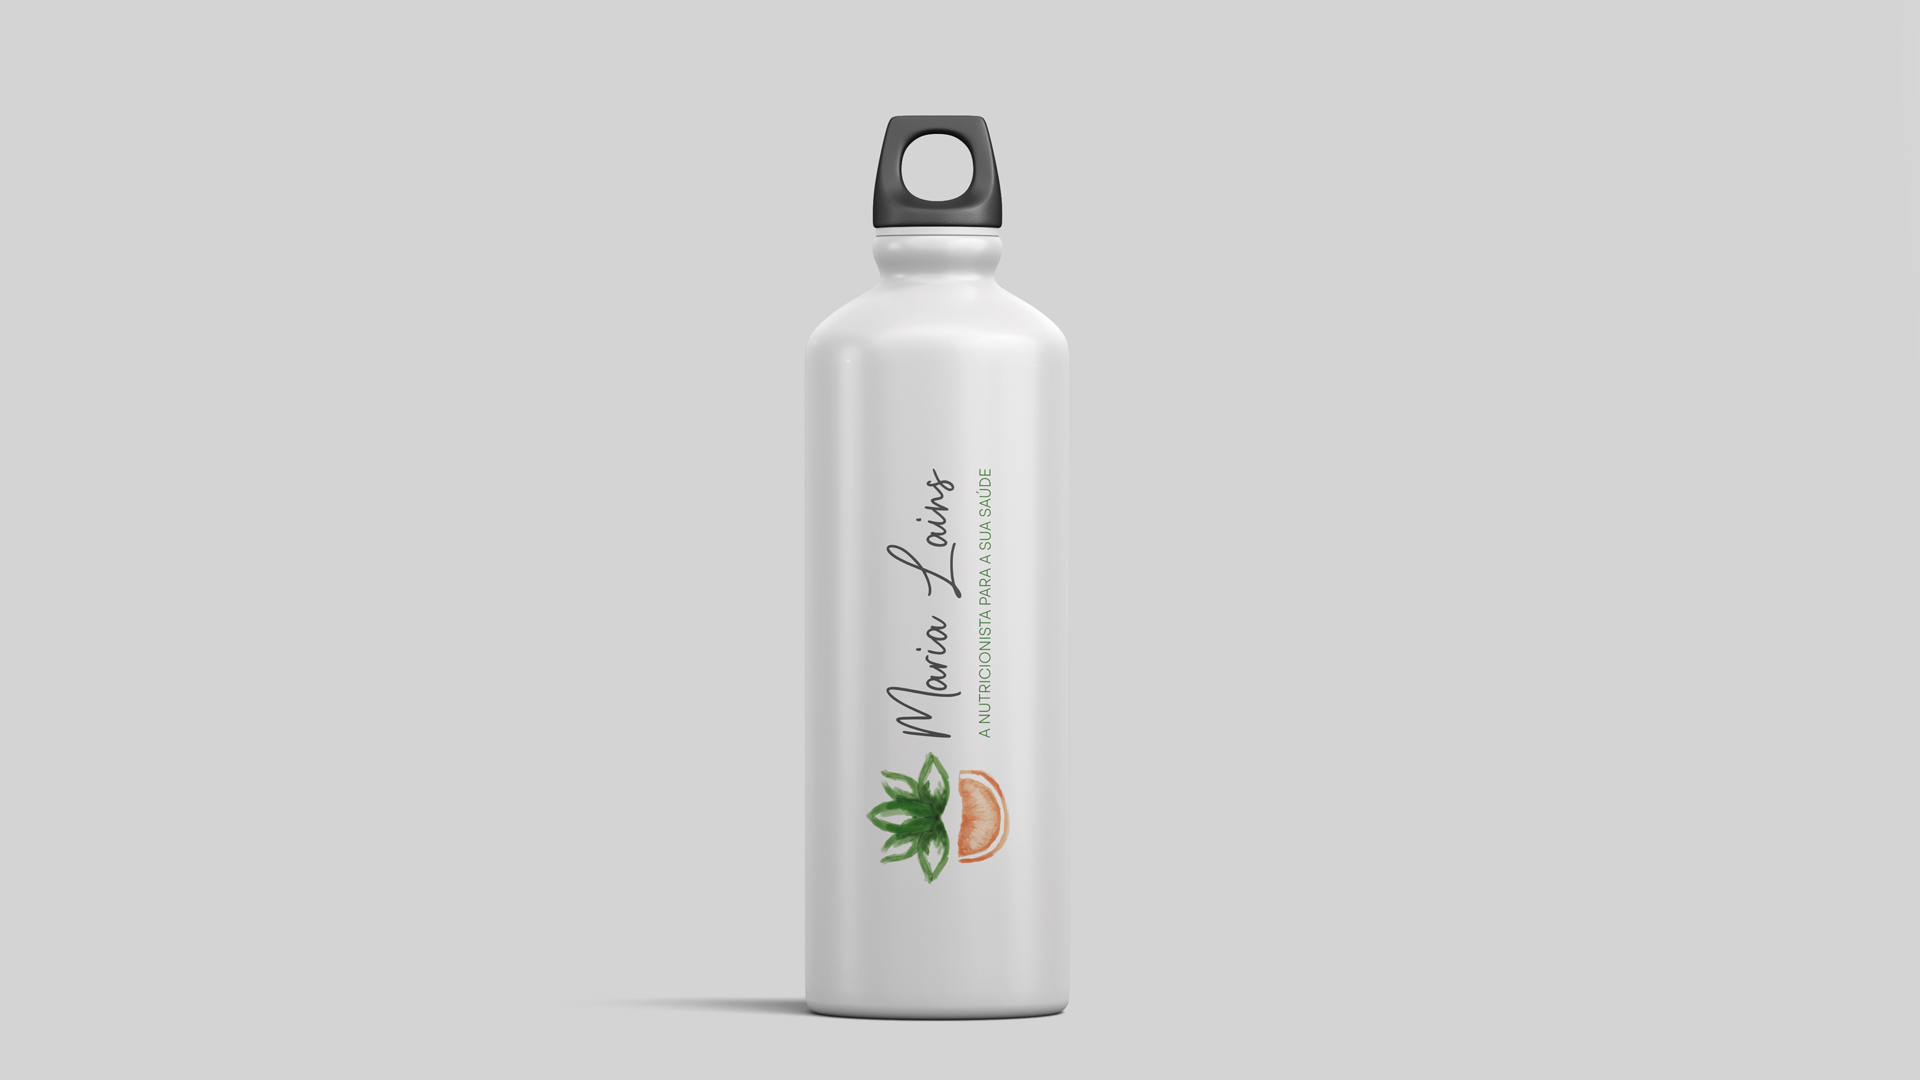 Wellness Brand Design - Water bottle with nutritionist logo